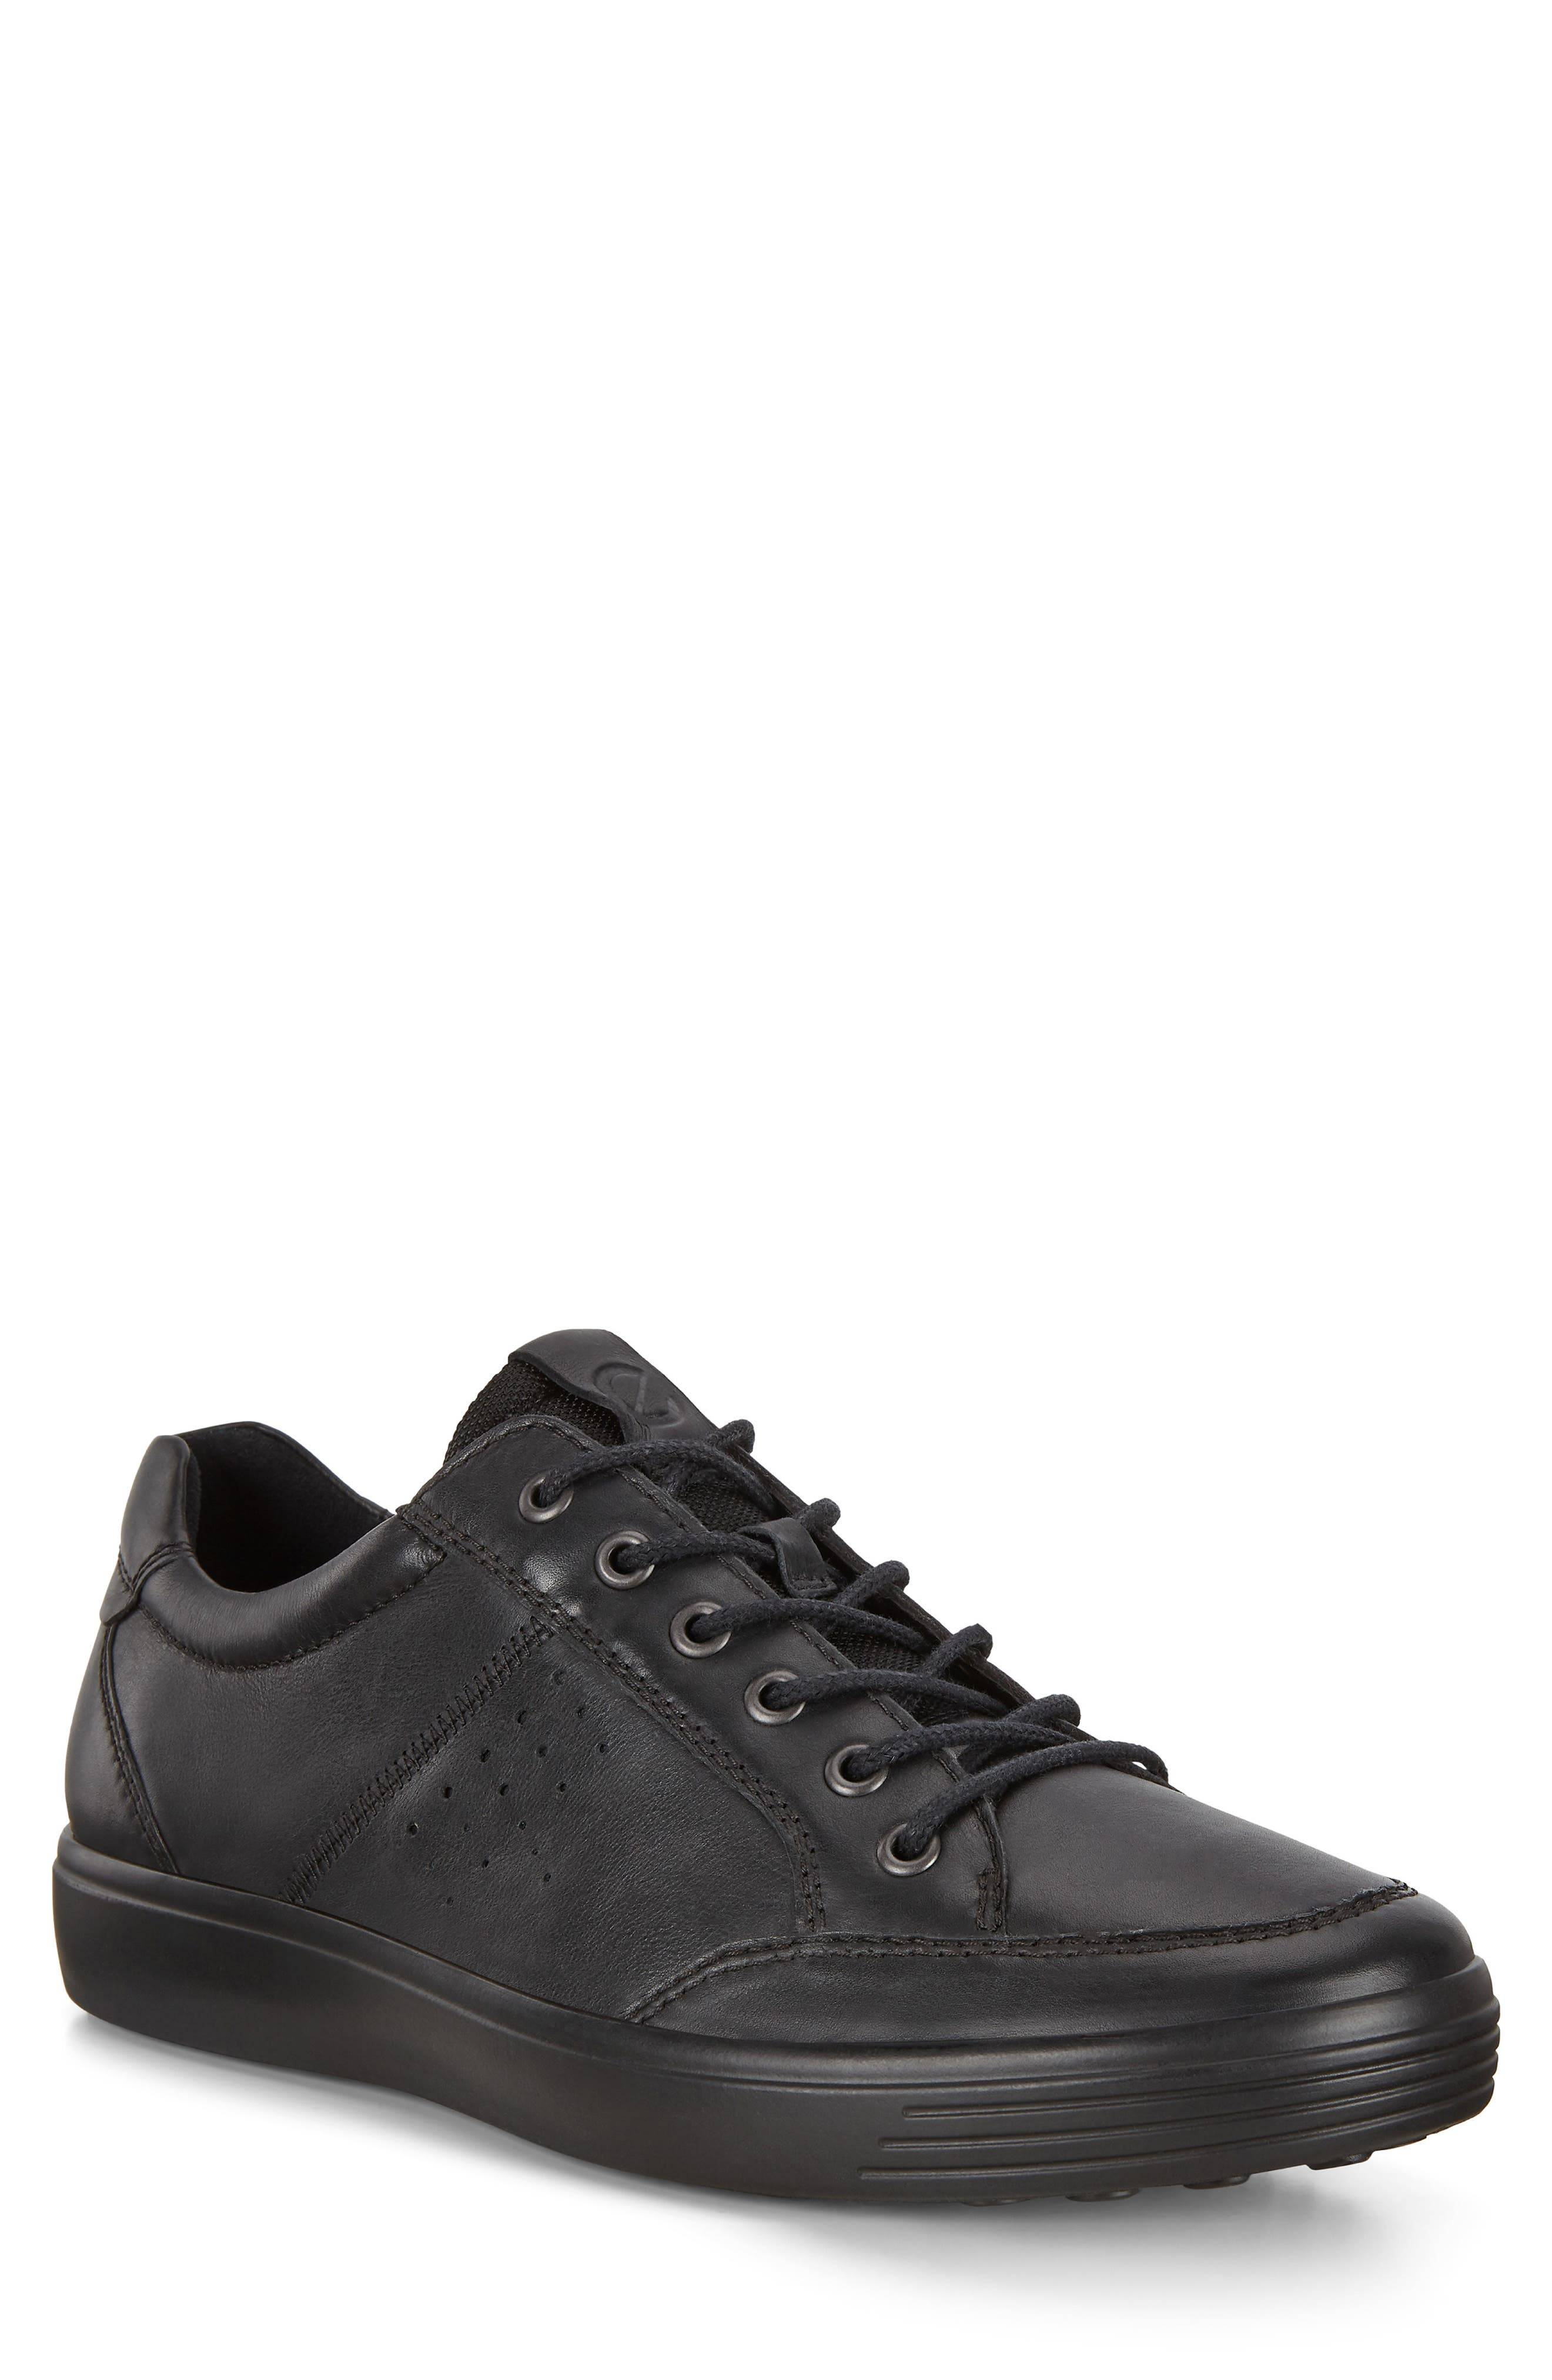 ECCO Men's Ecco Soft Classic Low Top Sneaker, Size 16-16.5US - Black